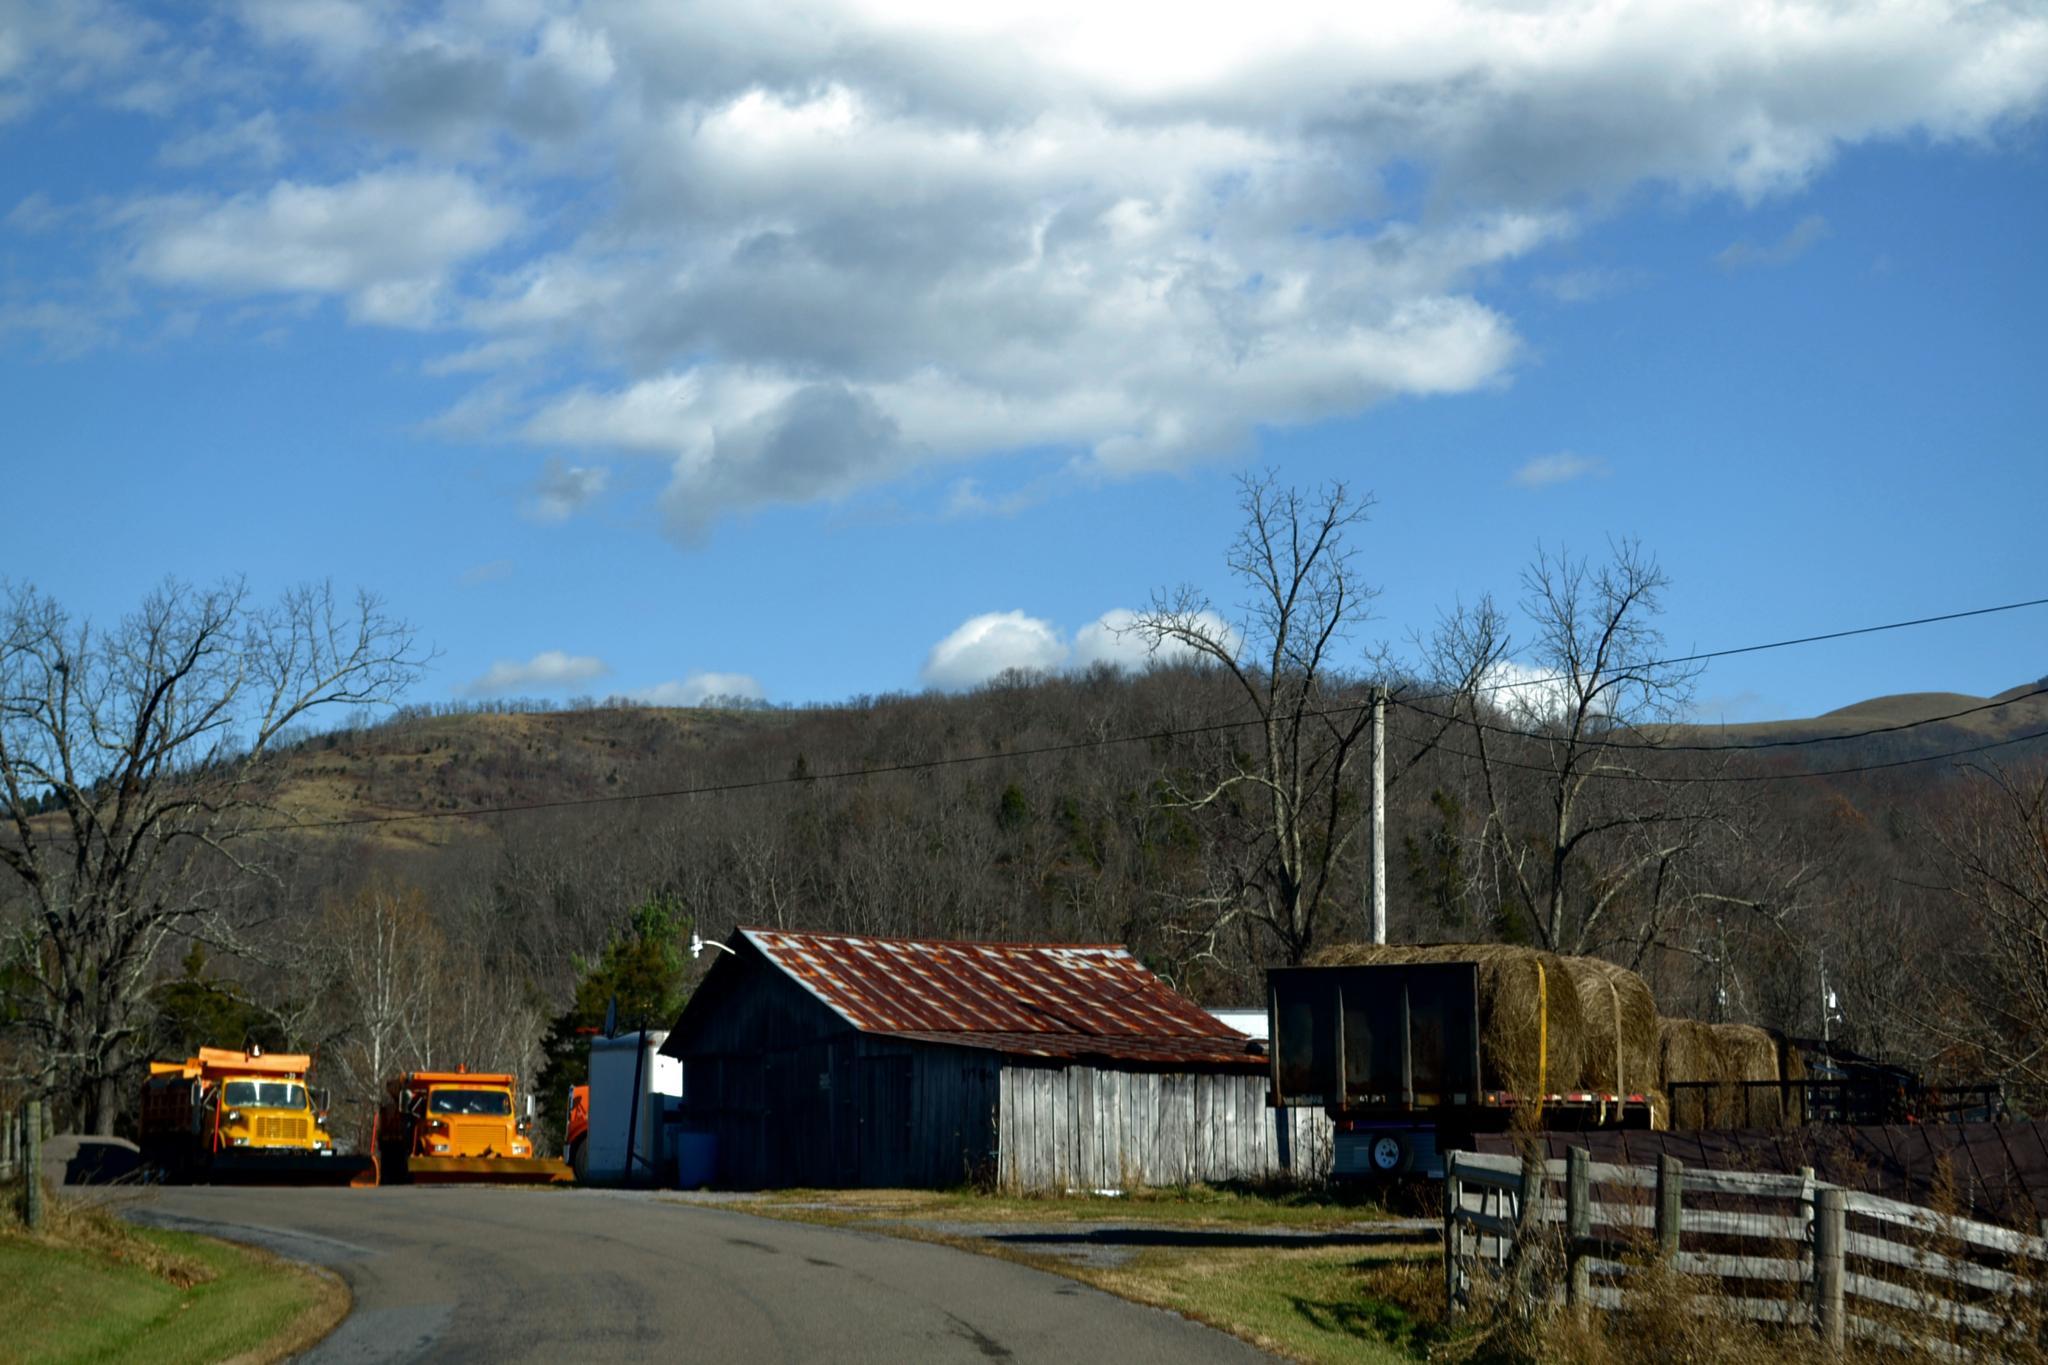 Barn, Hay and Trucks by lindandarrell